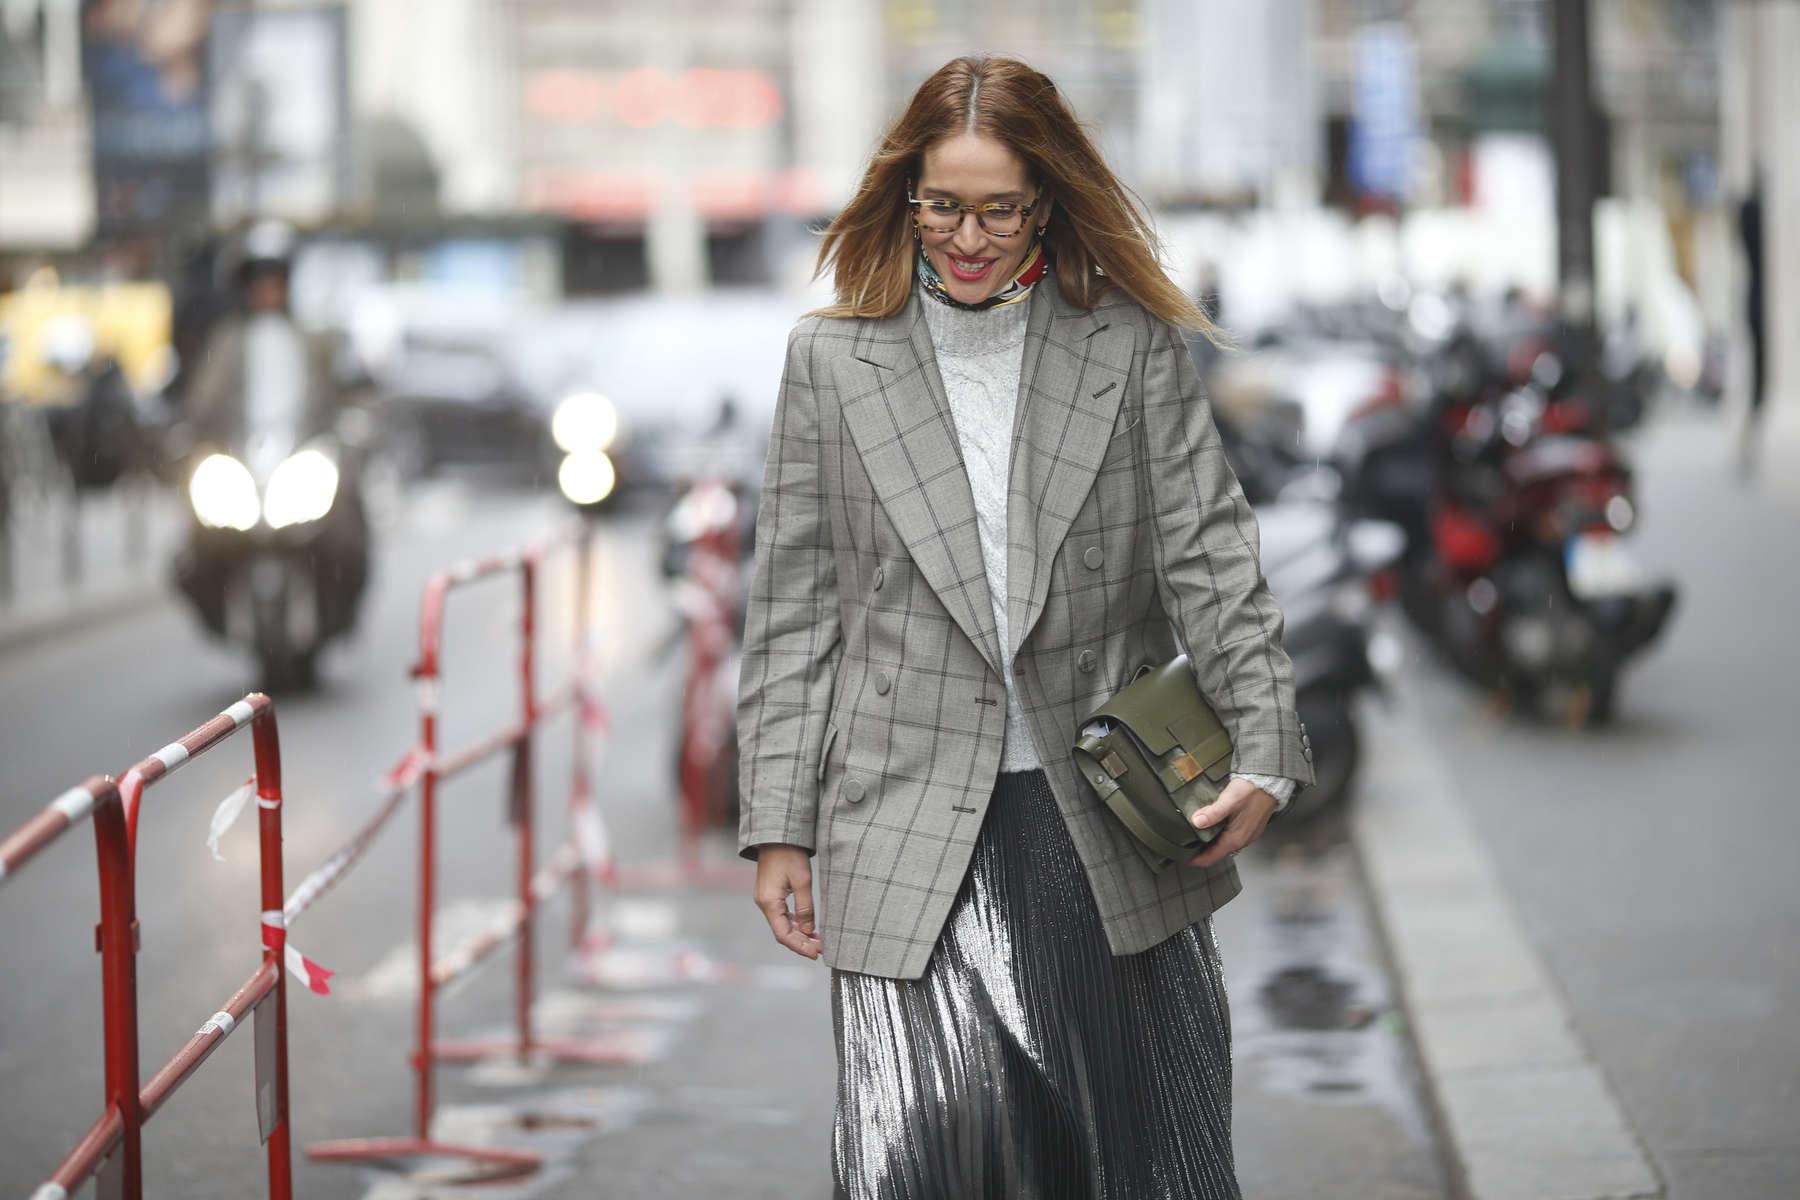 Tiany Kiriloff - Paris Fashion Week, March 2016